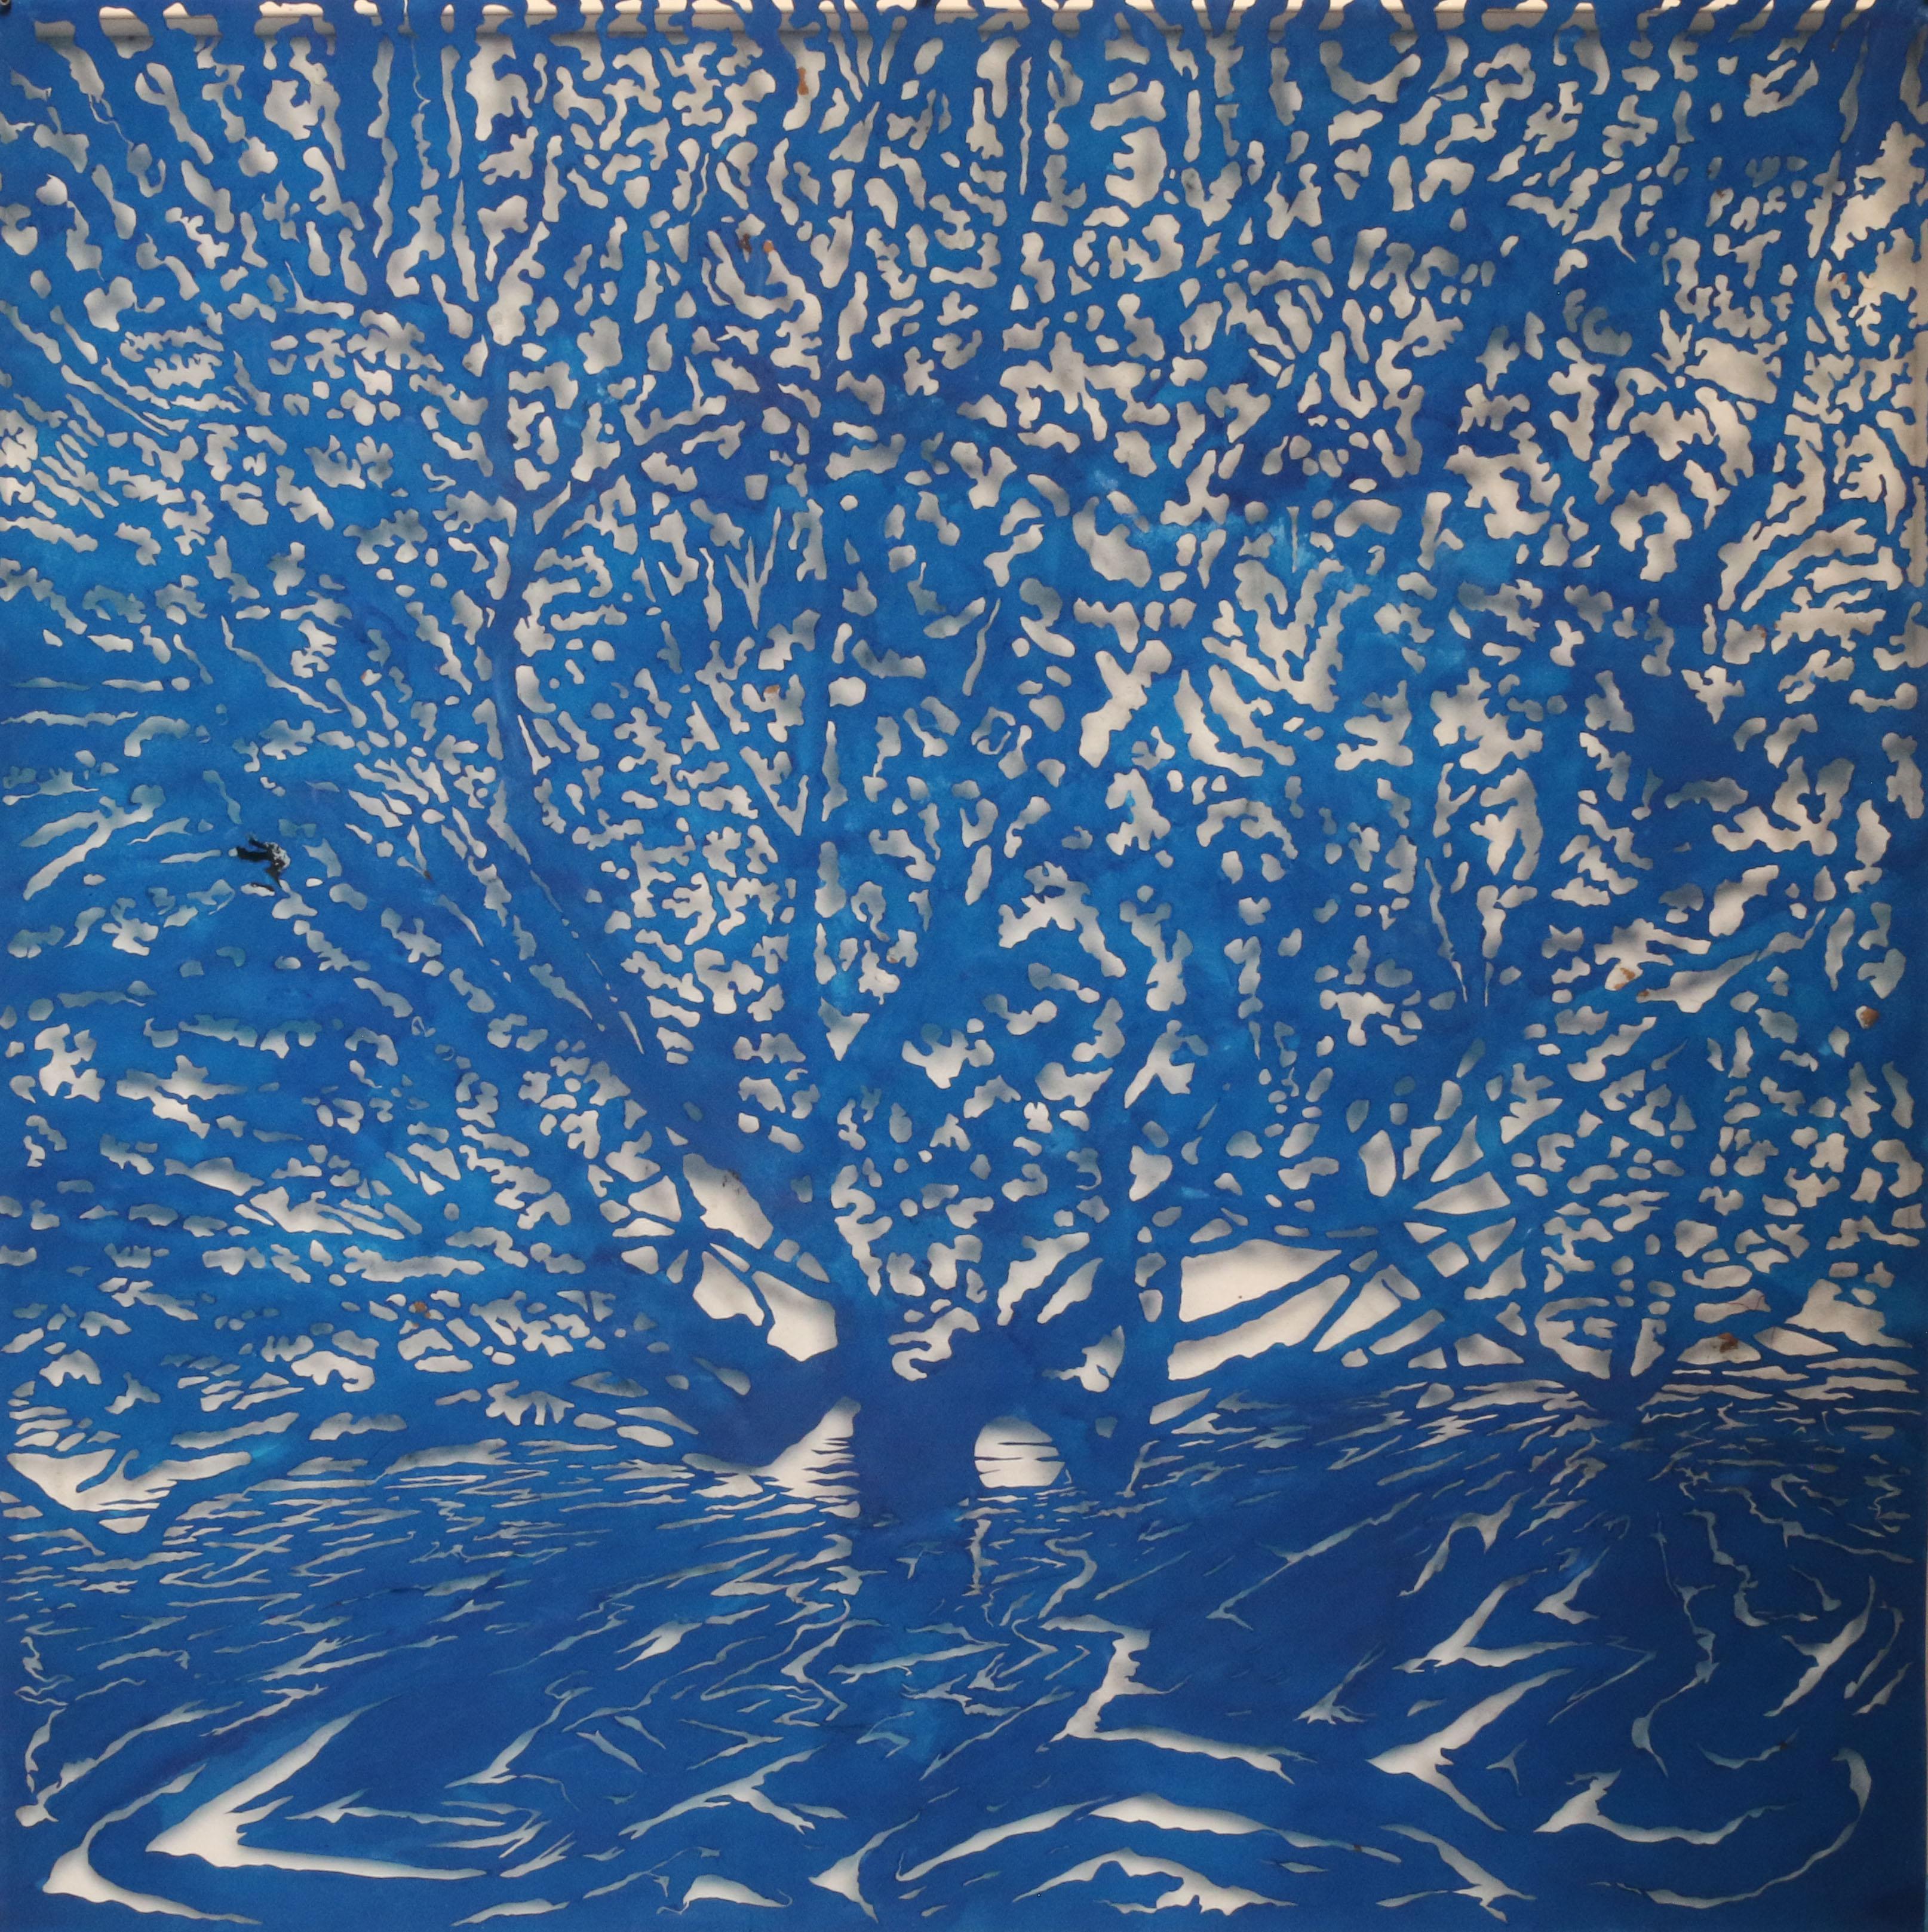 Art Atrium Andrew Tomkins Blue Cut, Meadowbank